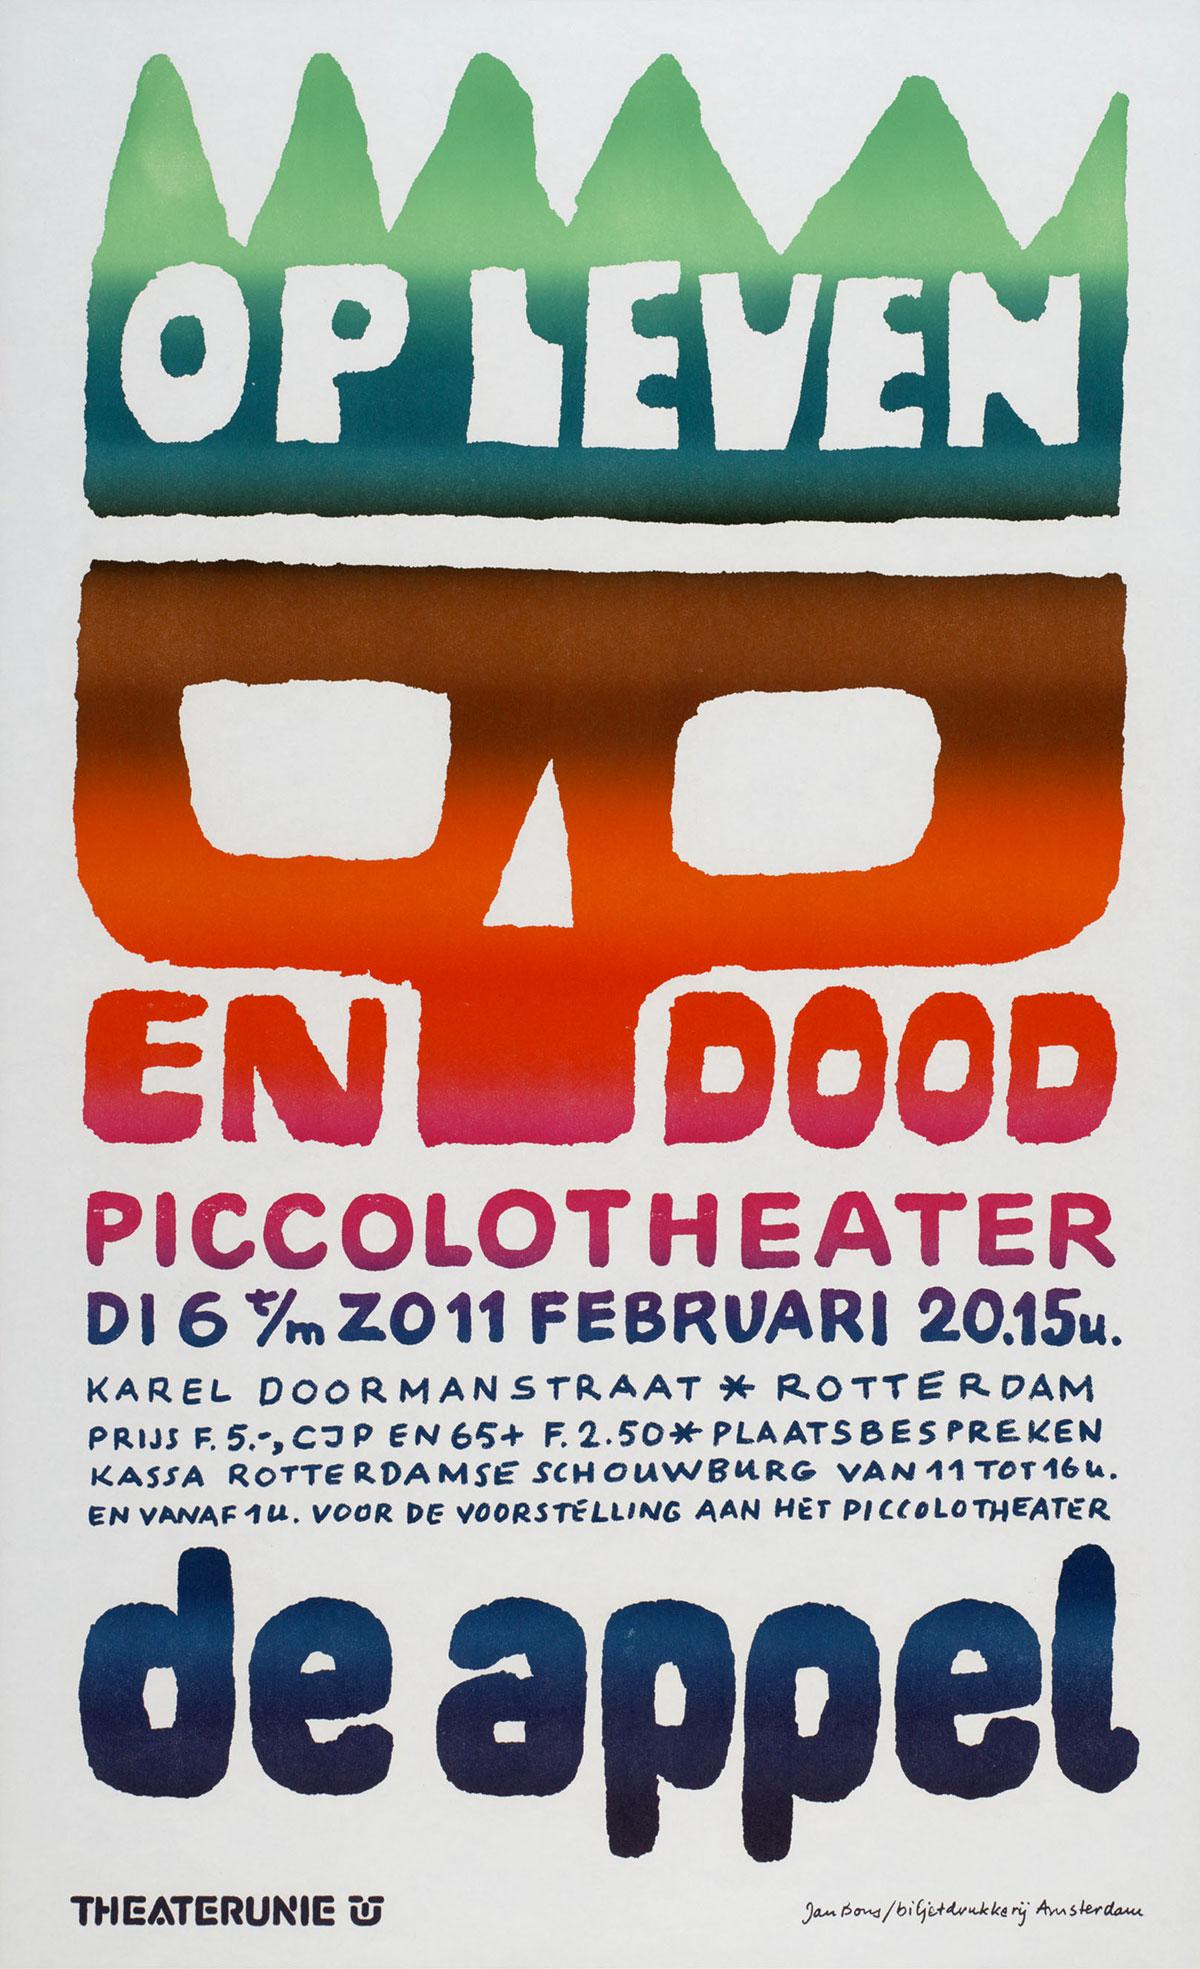 Jan-Bons-affiche-Op-leven-en-dood-De-Appel-1972